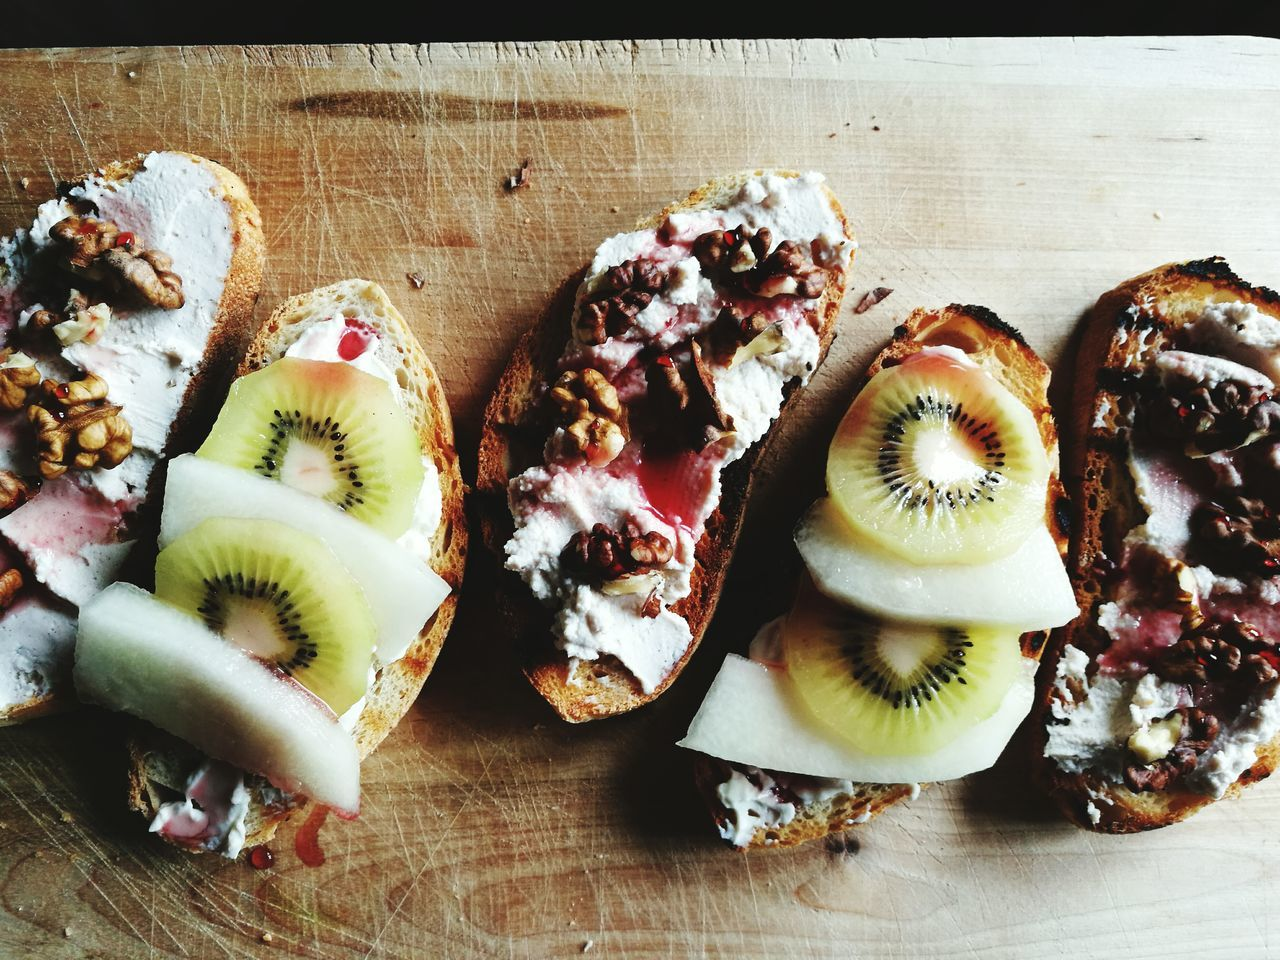 Una buonissima colazione fatta da @aleksandrajurkiewicz Breakfast Good Morning Toastbread Kiwi Wot Cheese! Chery Syrup Lifestyles Mangiaresano Noci Sciroppodiamarena Ricotta Panetostato